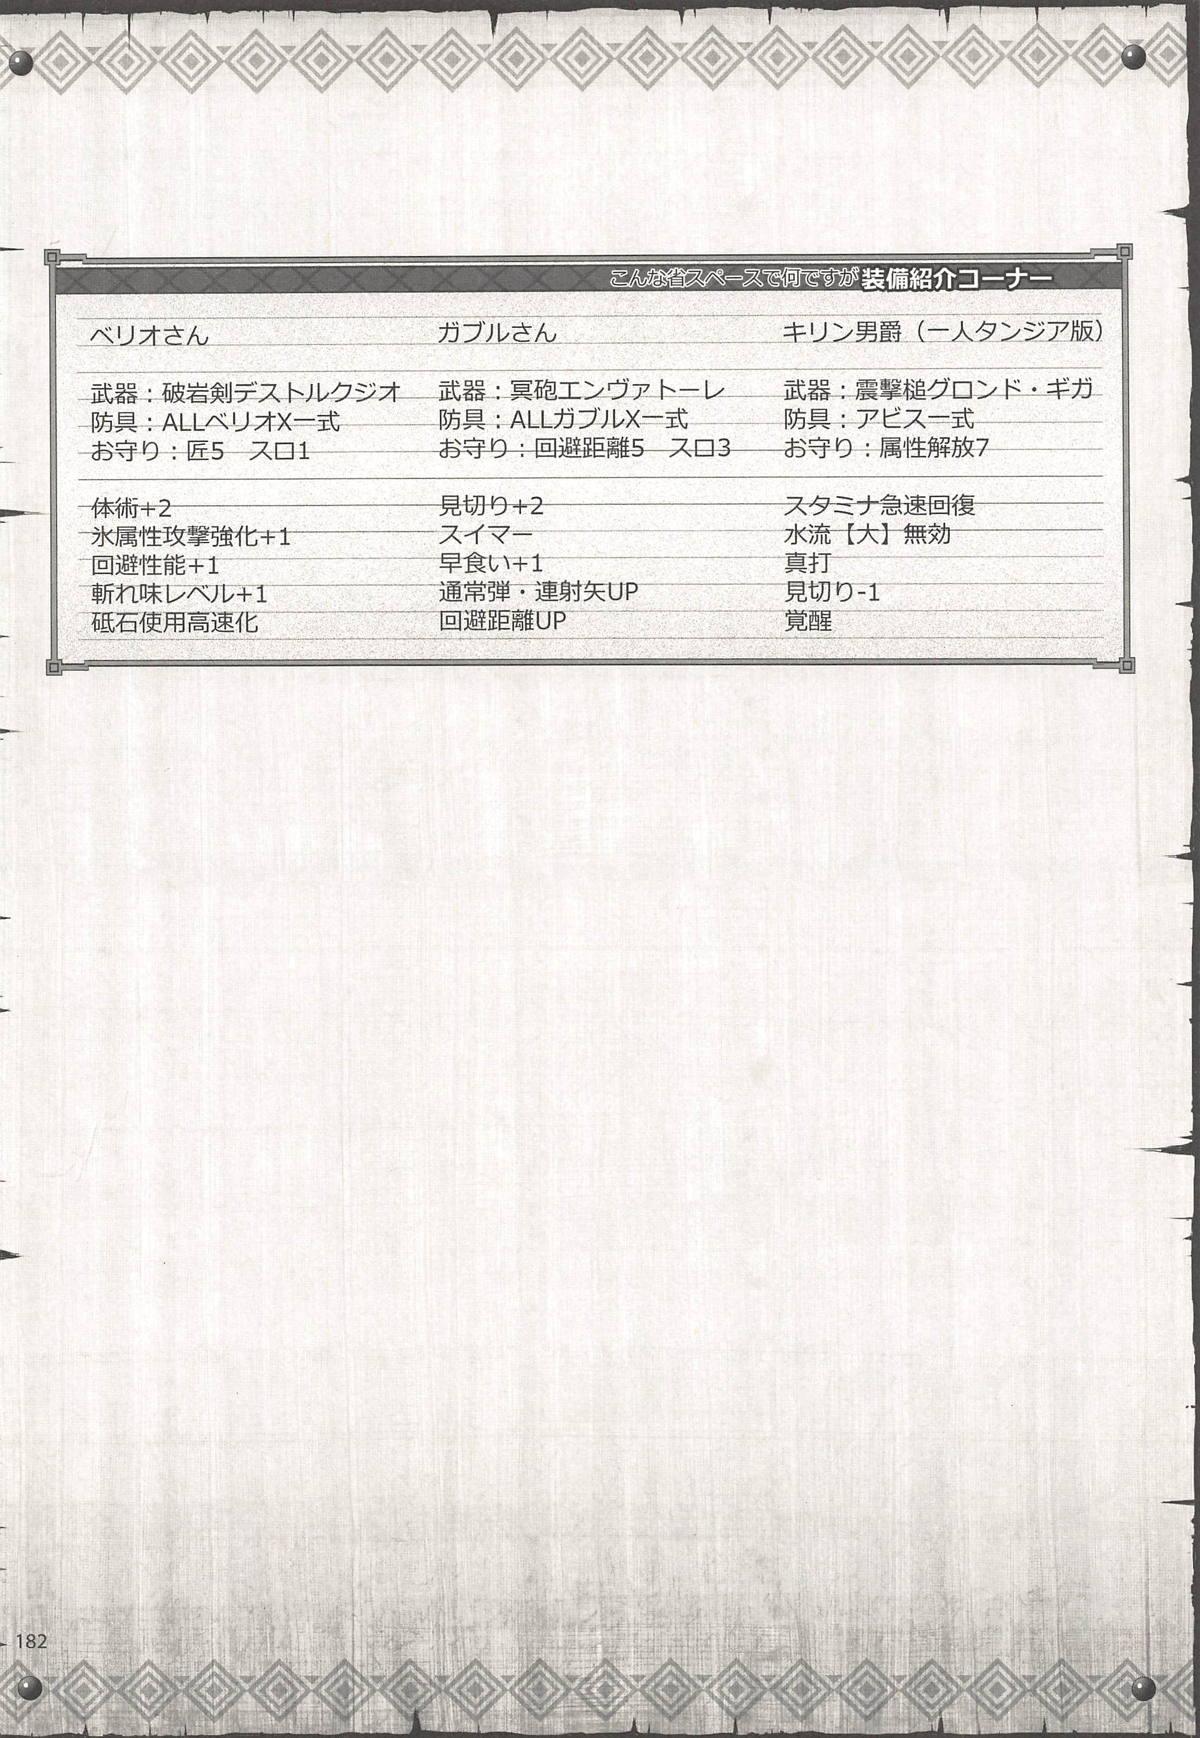 Monhan no Erohon G3 11→14+Juuhi+Omakebon Soushuuhen 179